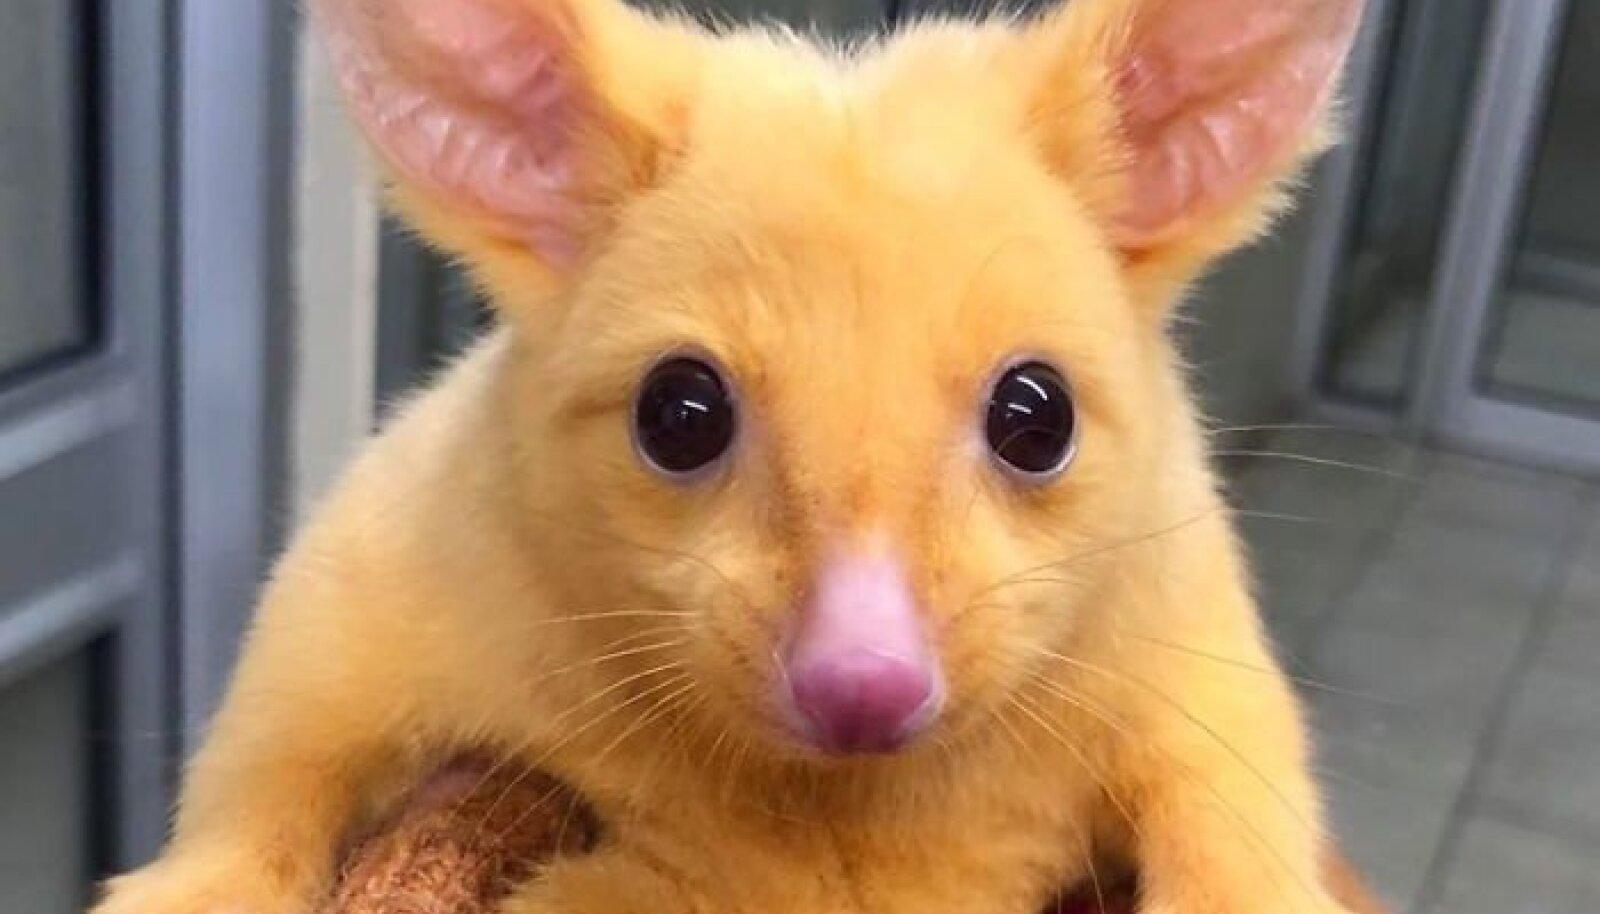 Haruldane kuldne opossum